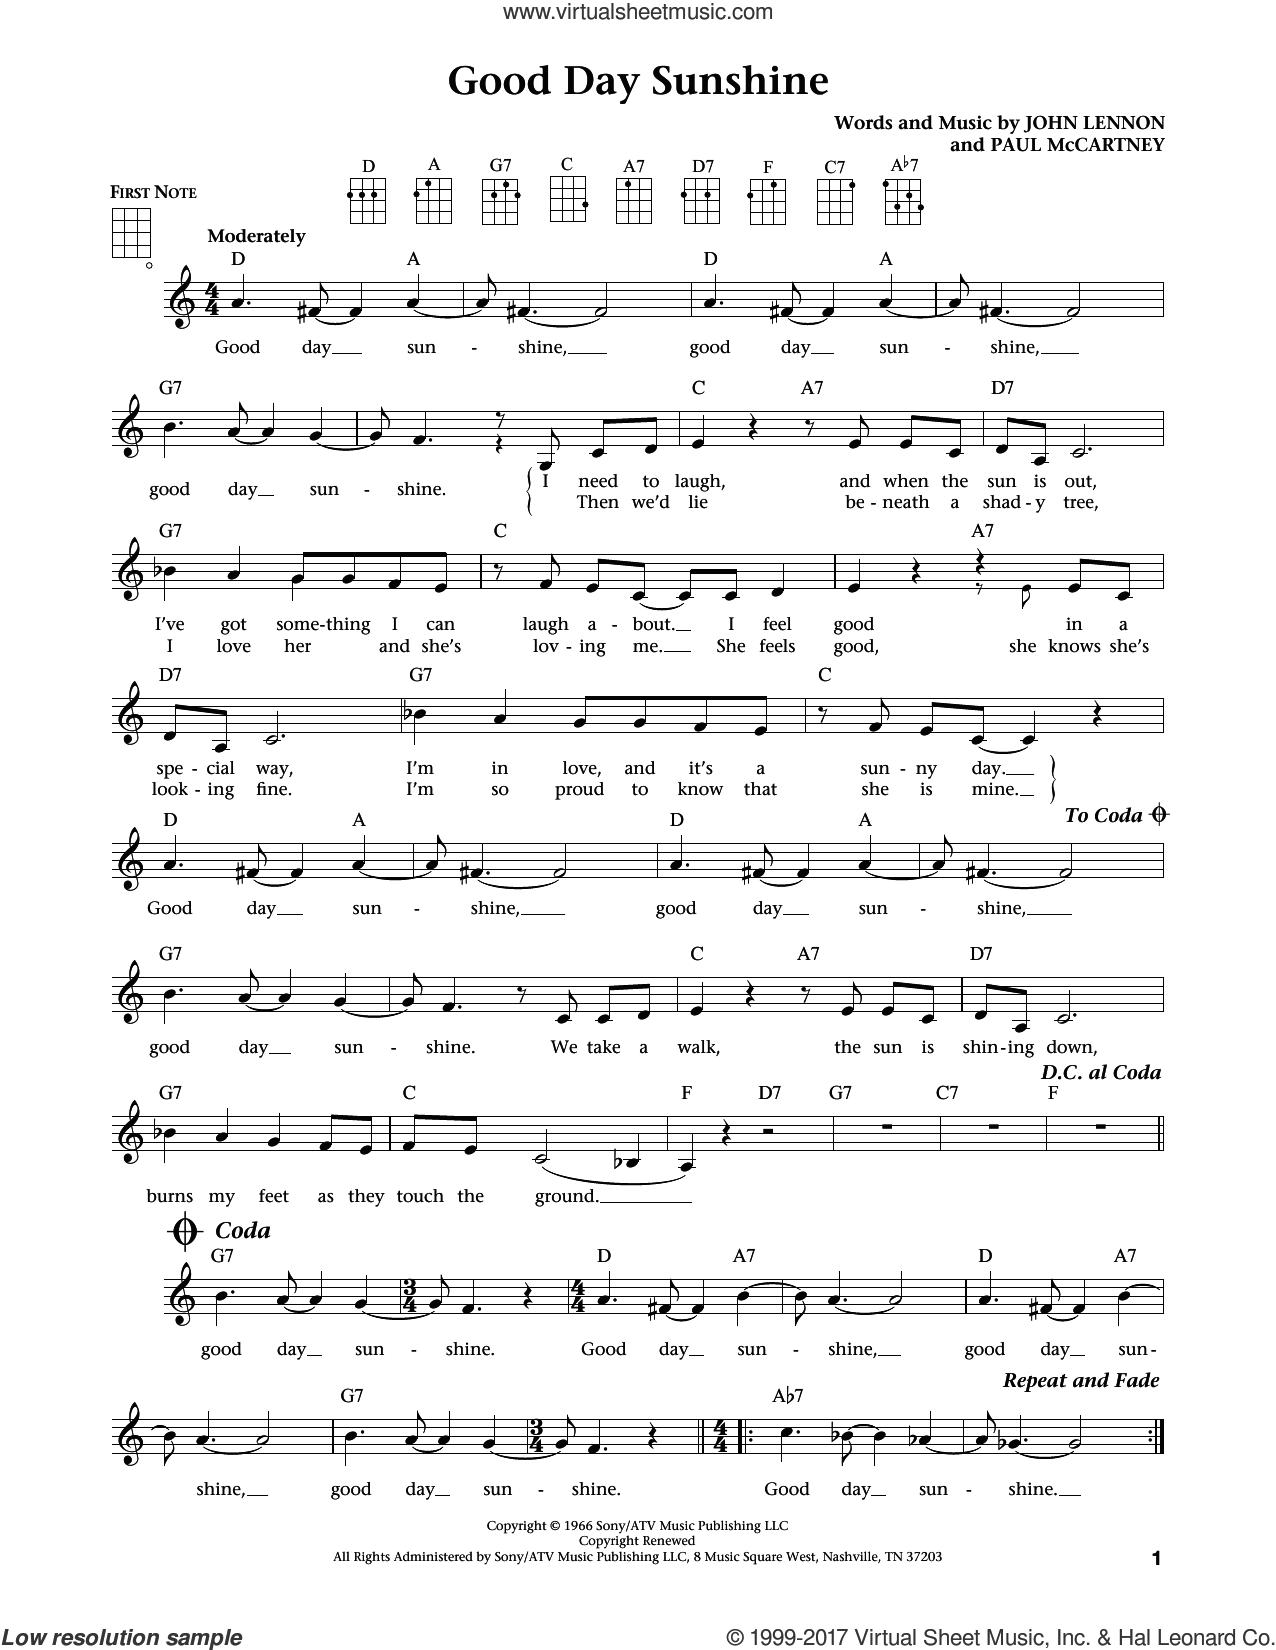 Good Day Sunshine (from The Daily Ukulele) (arr. Liz and Jim Beloff) sheet music for ukulele by The Beatles, Jim Beloff, Liz Beloff, John Lennon and Paul McCartney, intermediate skill level